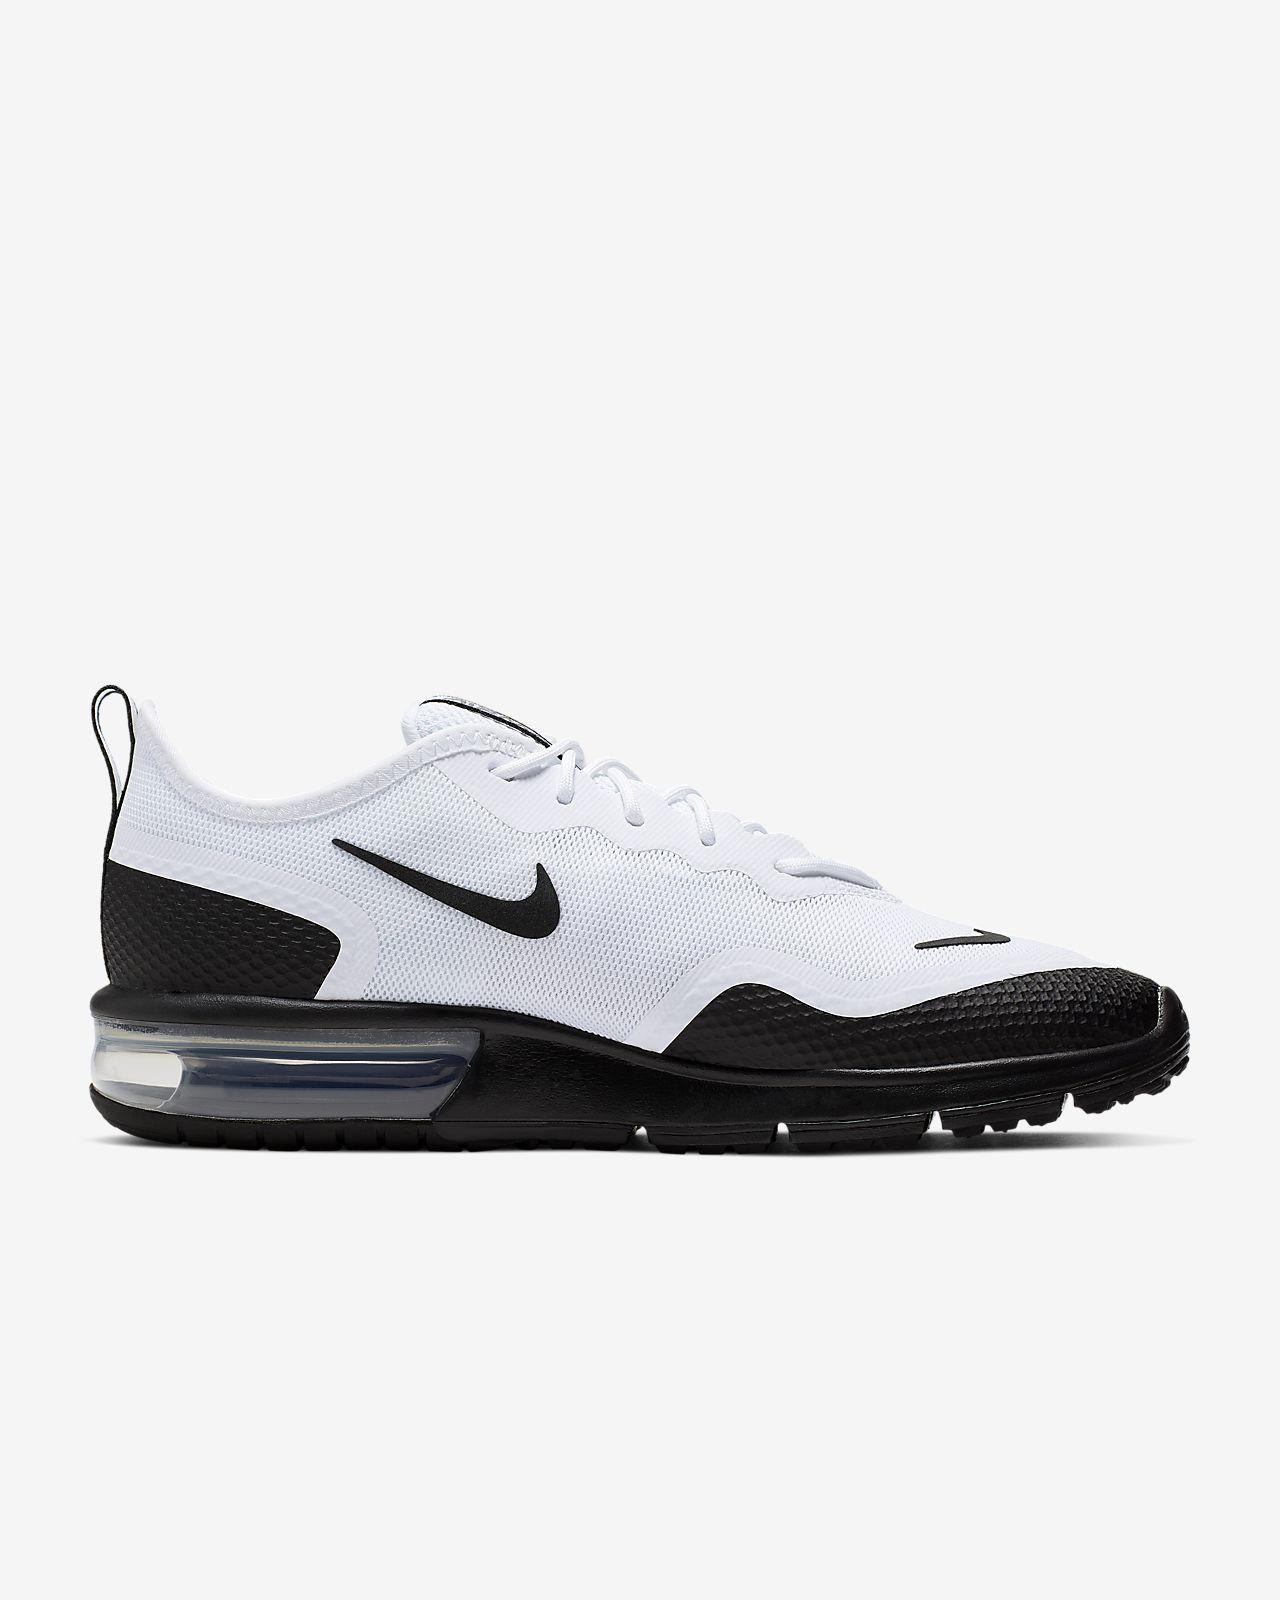 Nike Air Max Sequent 4,5 Zapatillas de running Hombre